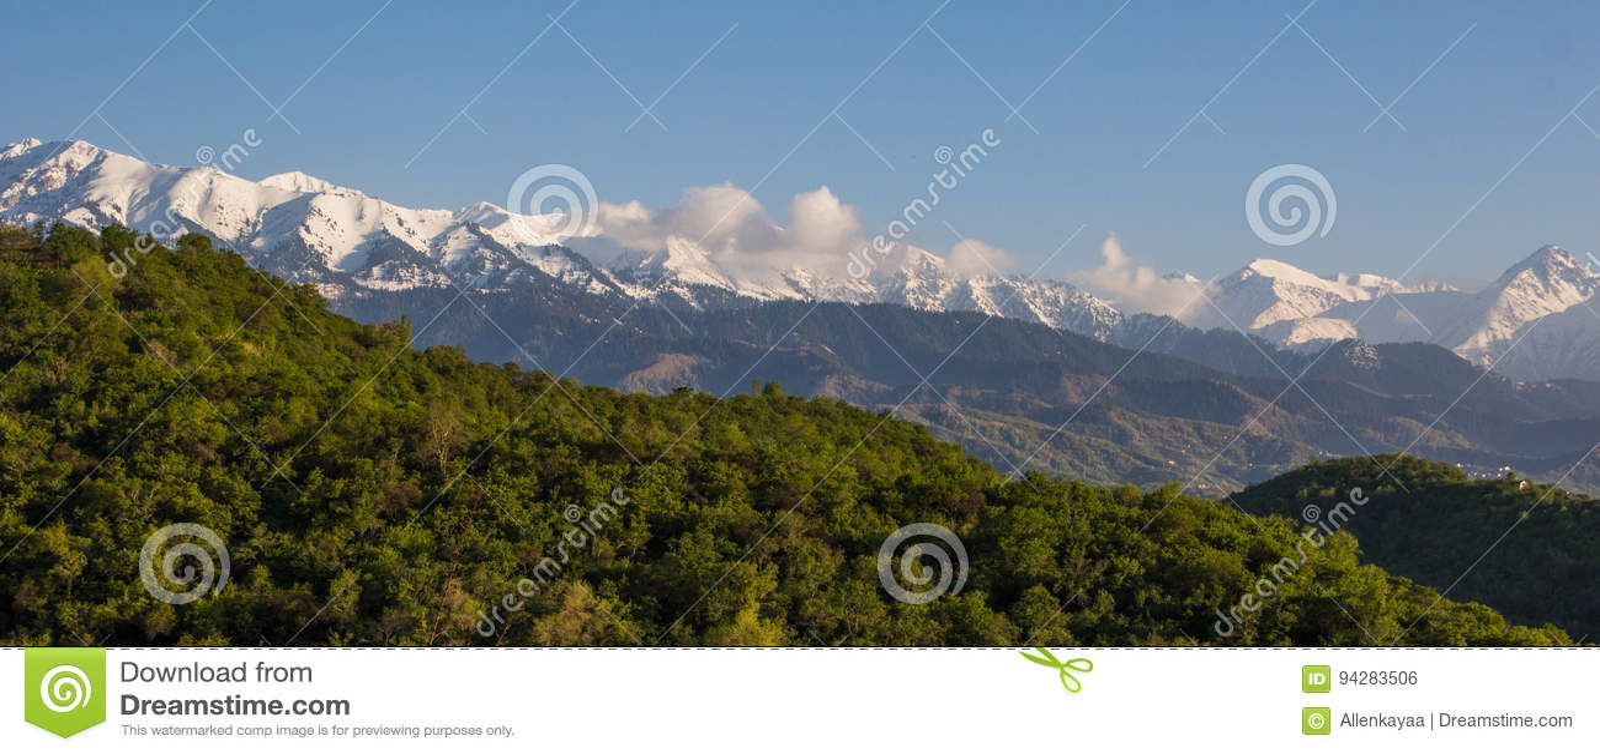 Berg landskap, Tien-Shan Mountains, Almaty, Kasakhstan